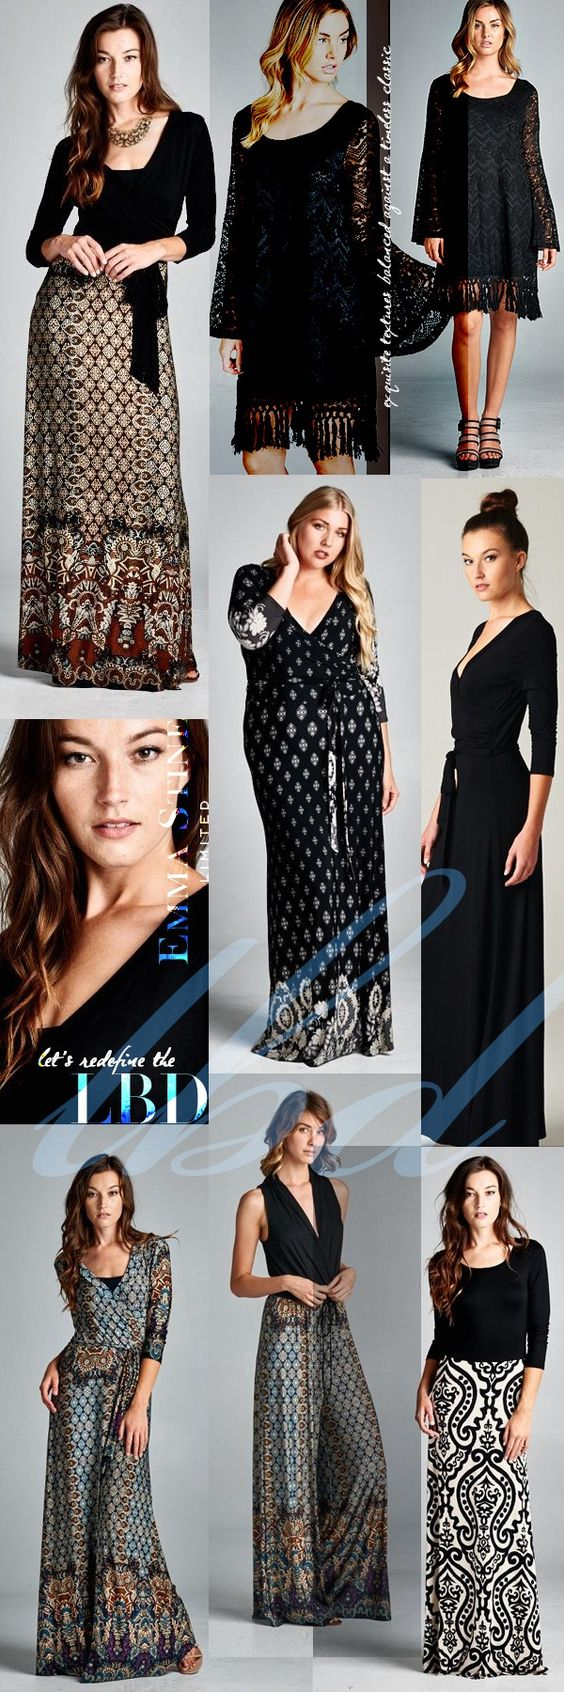 Timeless Fall fashion from Emma Stine Limited ==